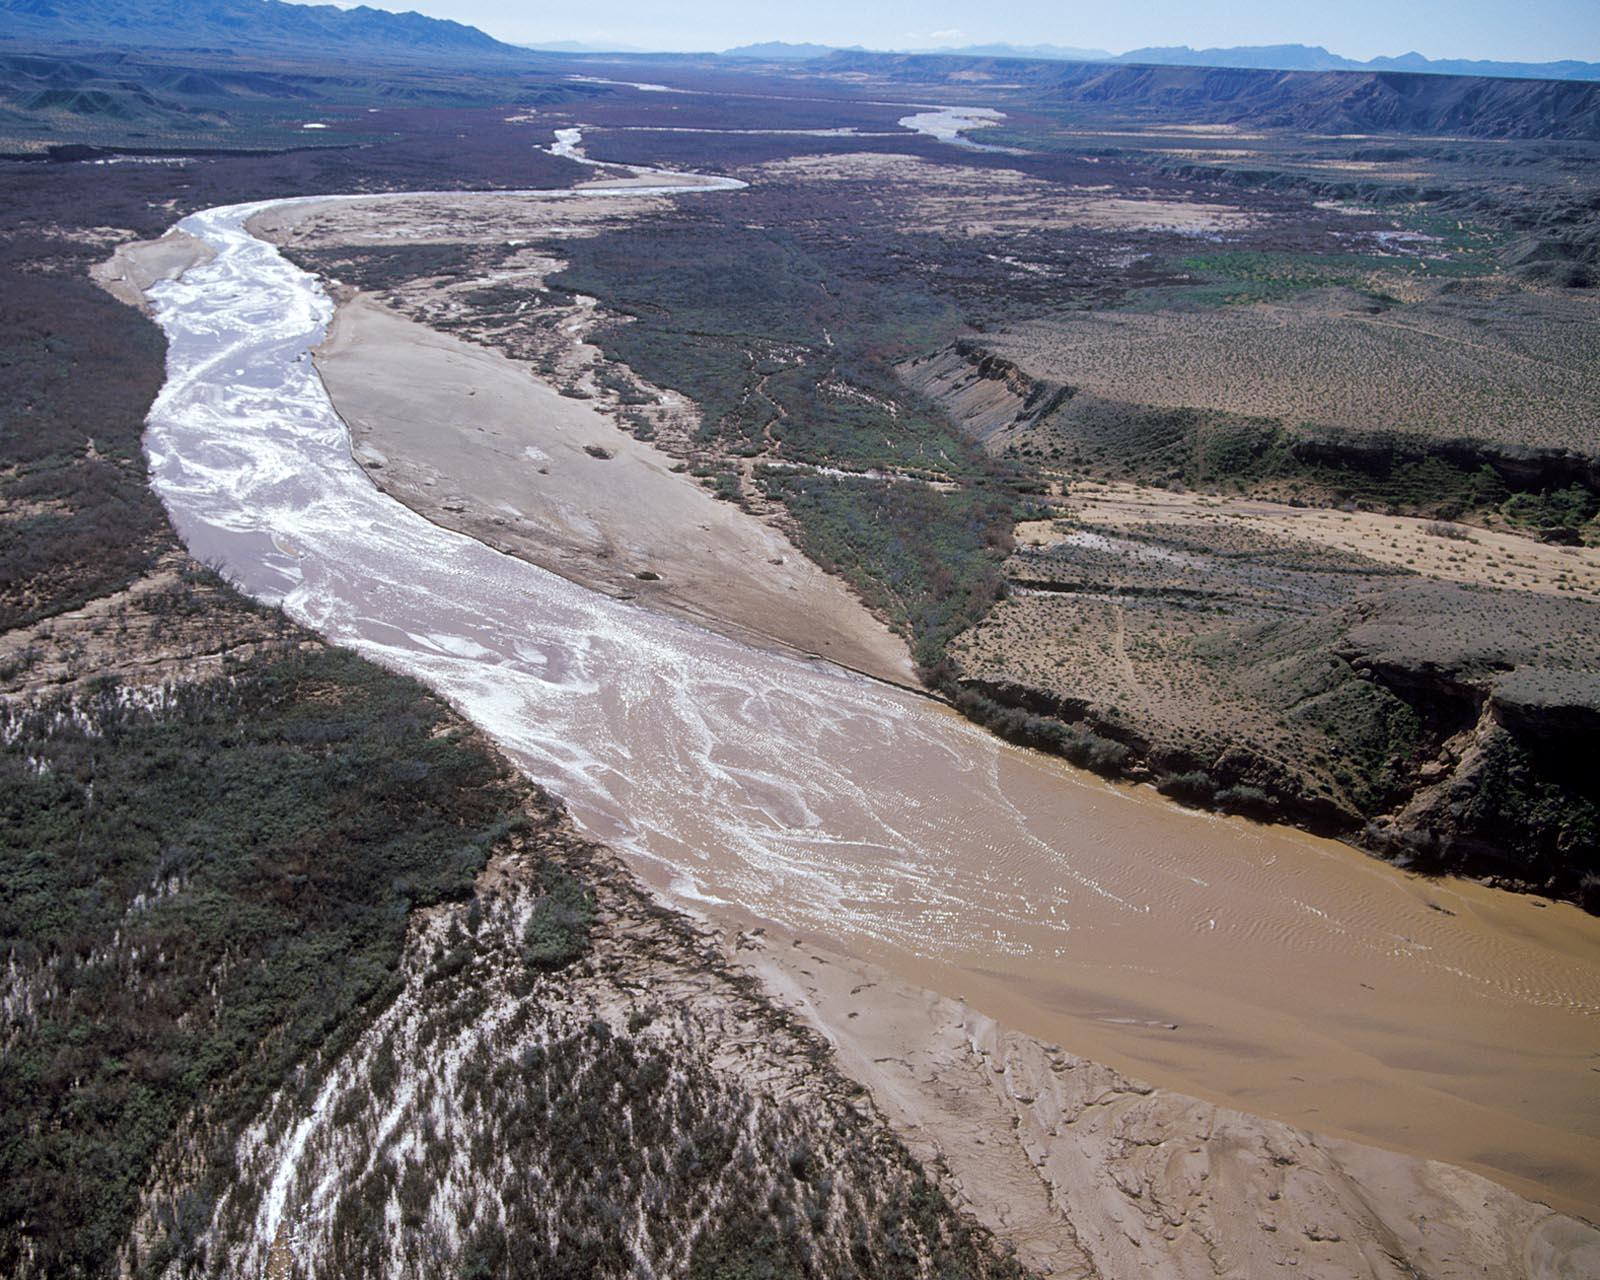 The Virgin River flowing through the high mountain desert.